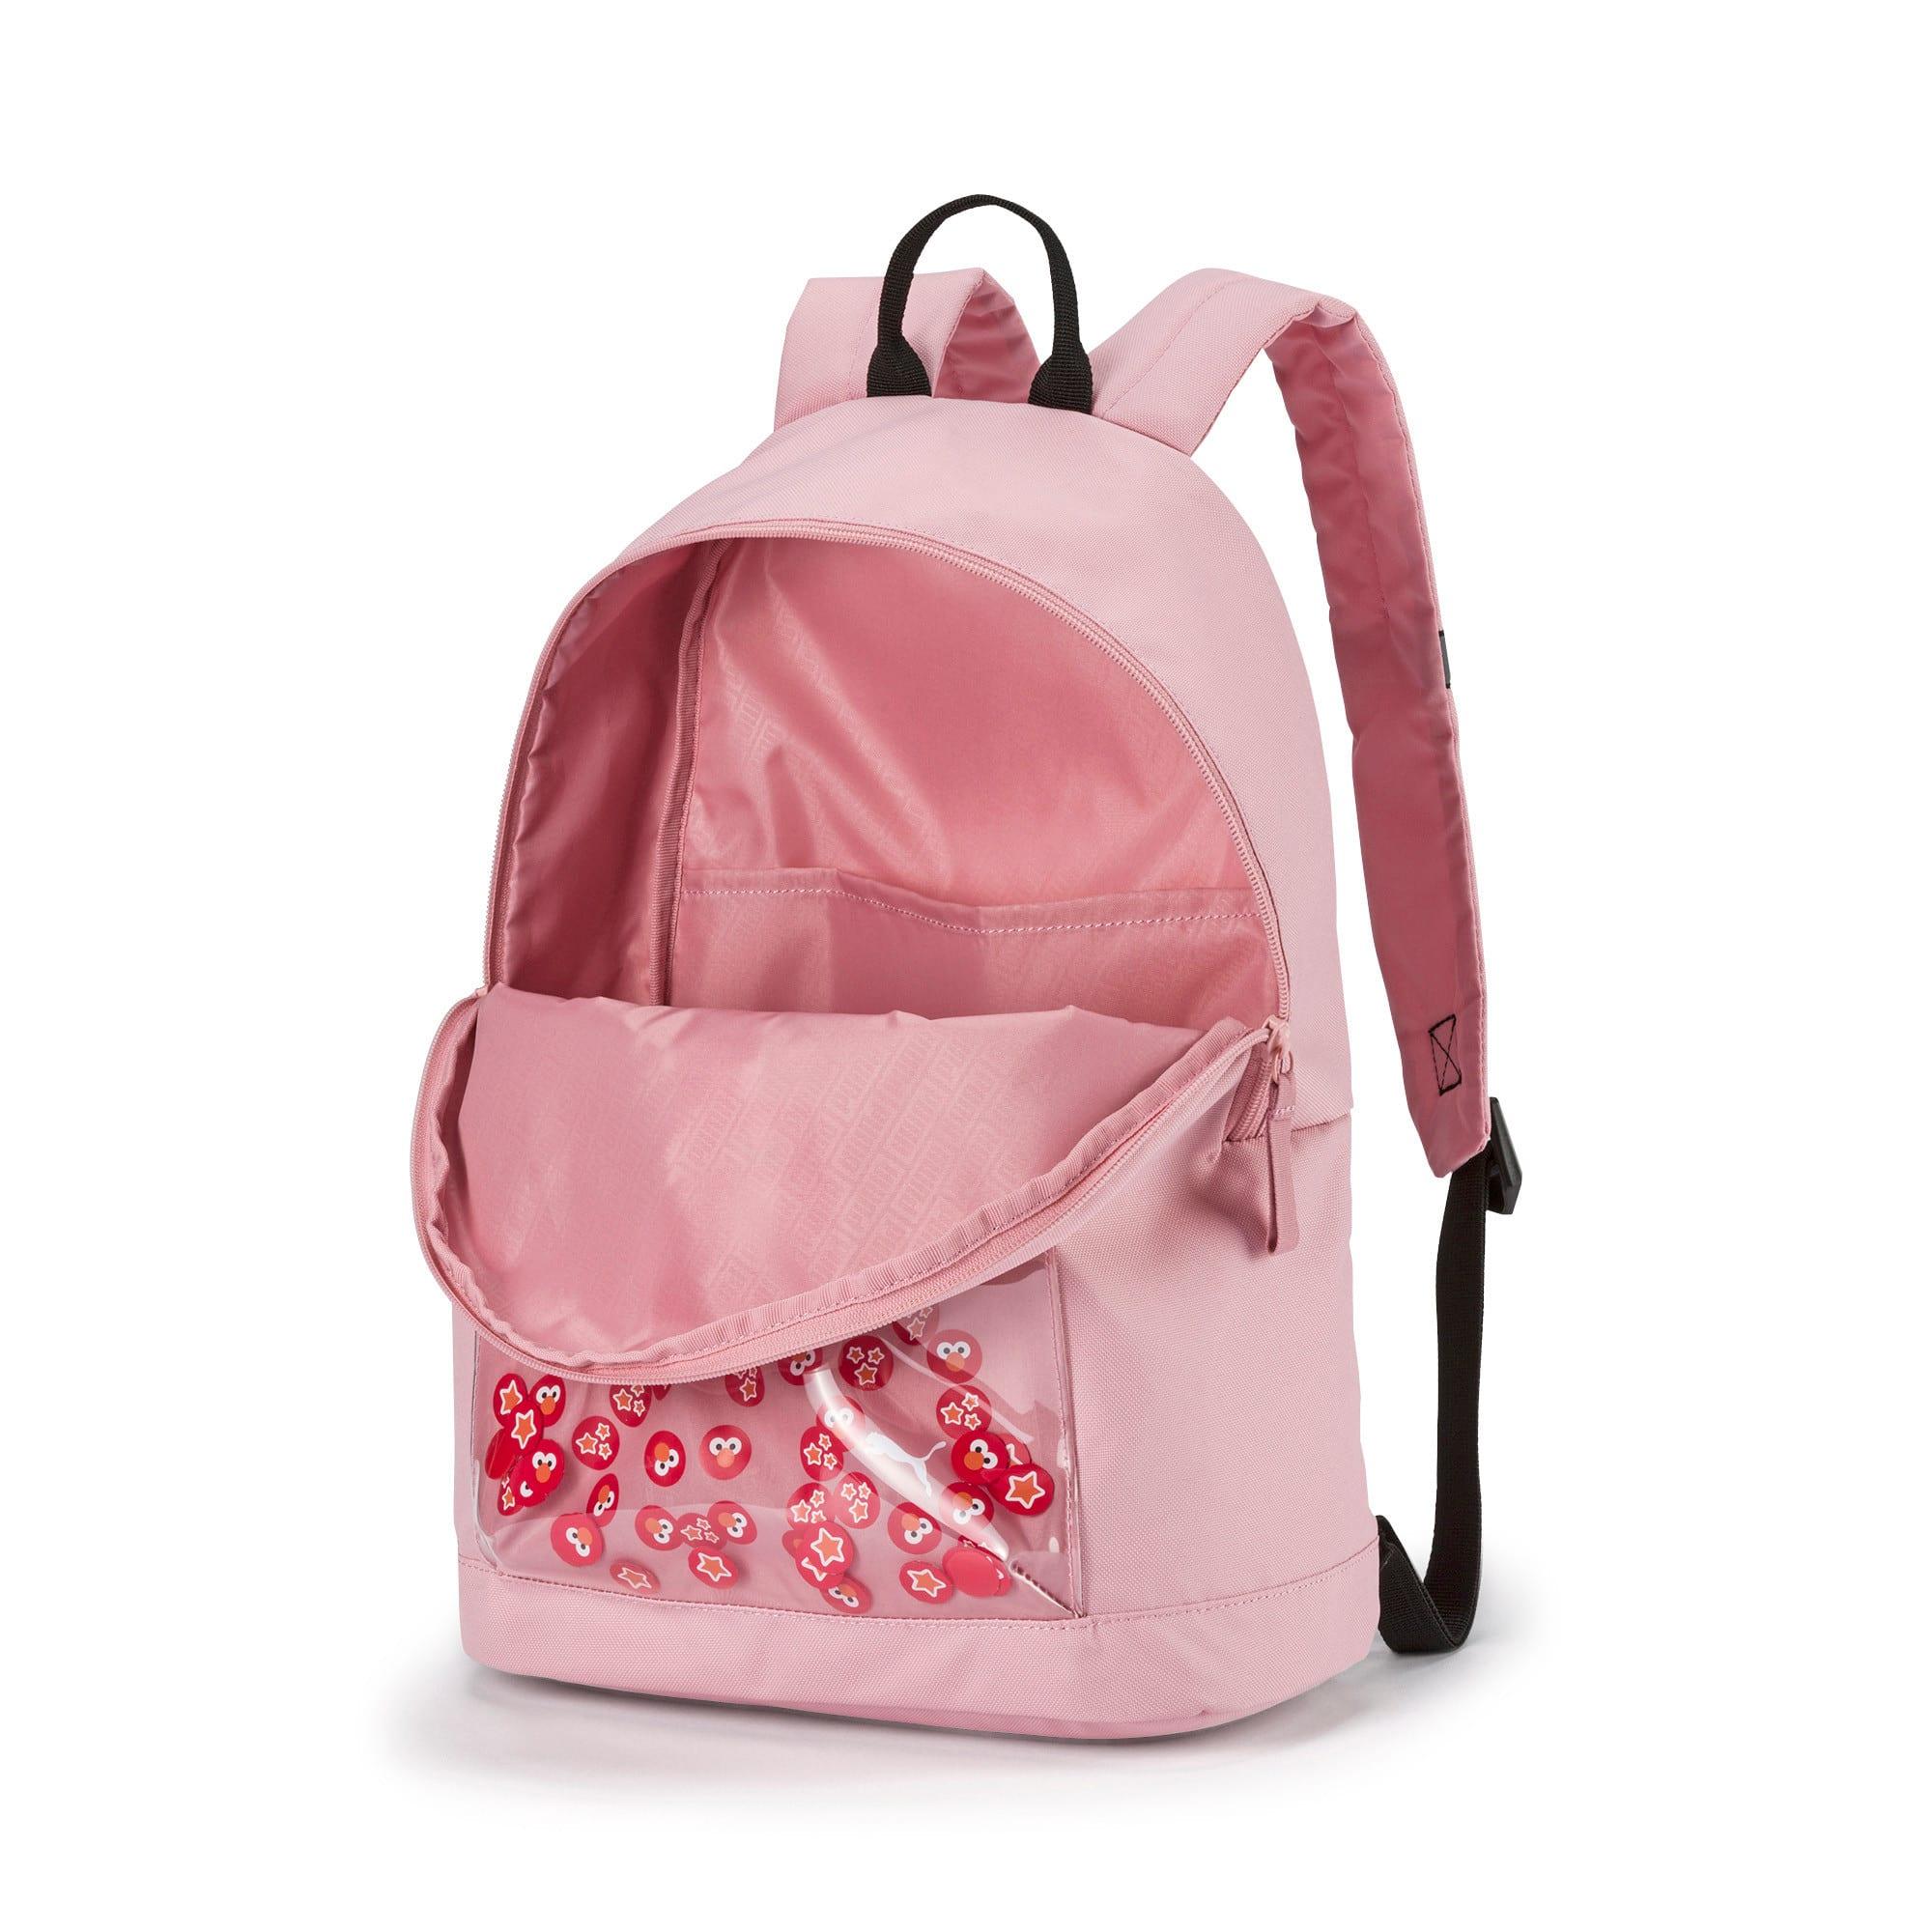 Thumbnail 3 of PUMA x SESAME STREET Kids' Sport Backpack, Bridal Rose, medium